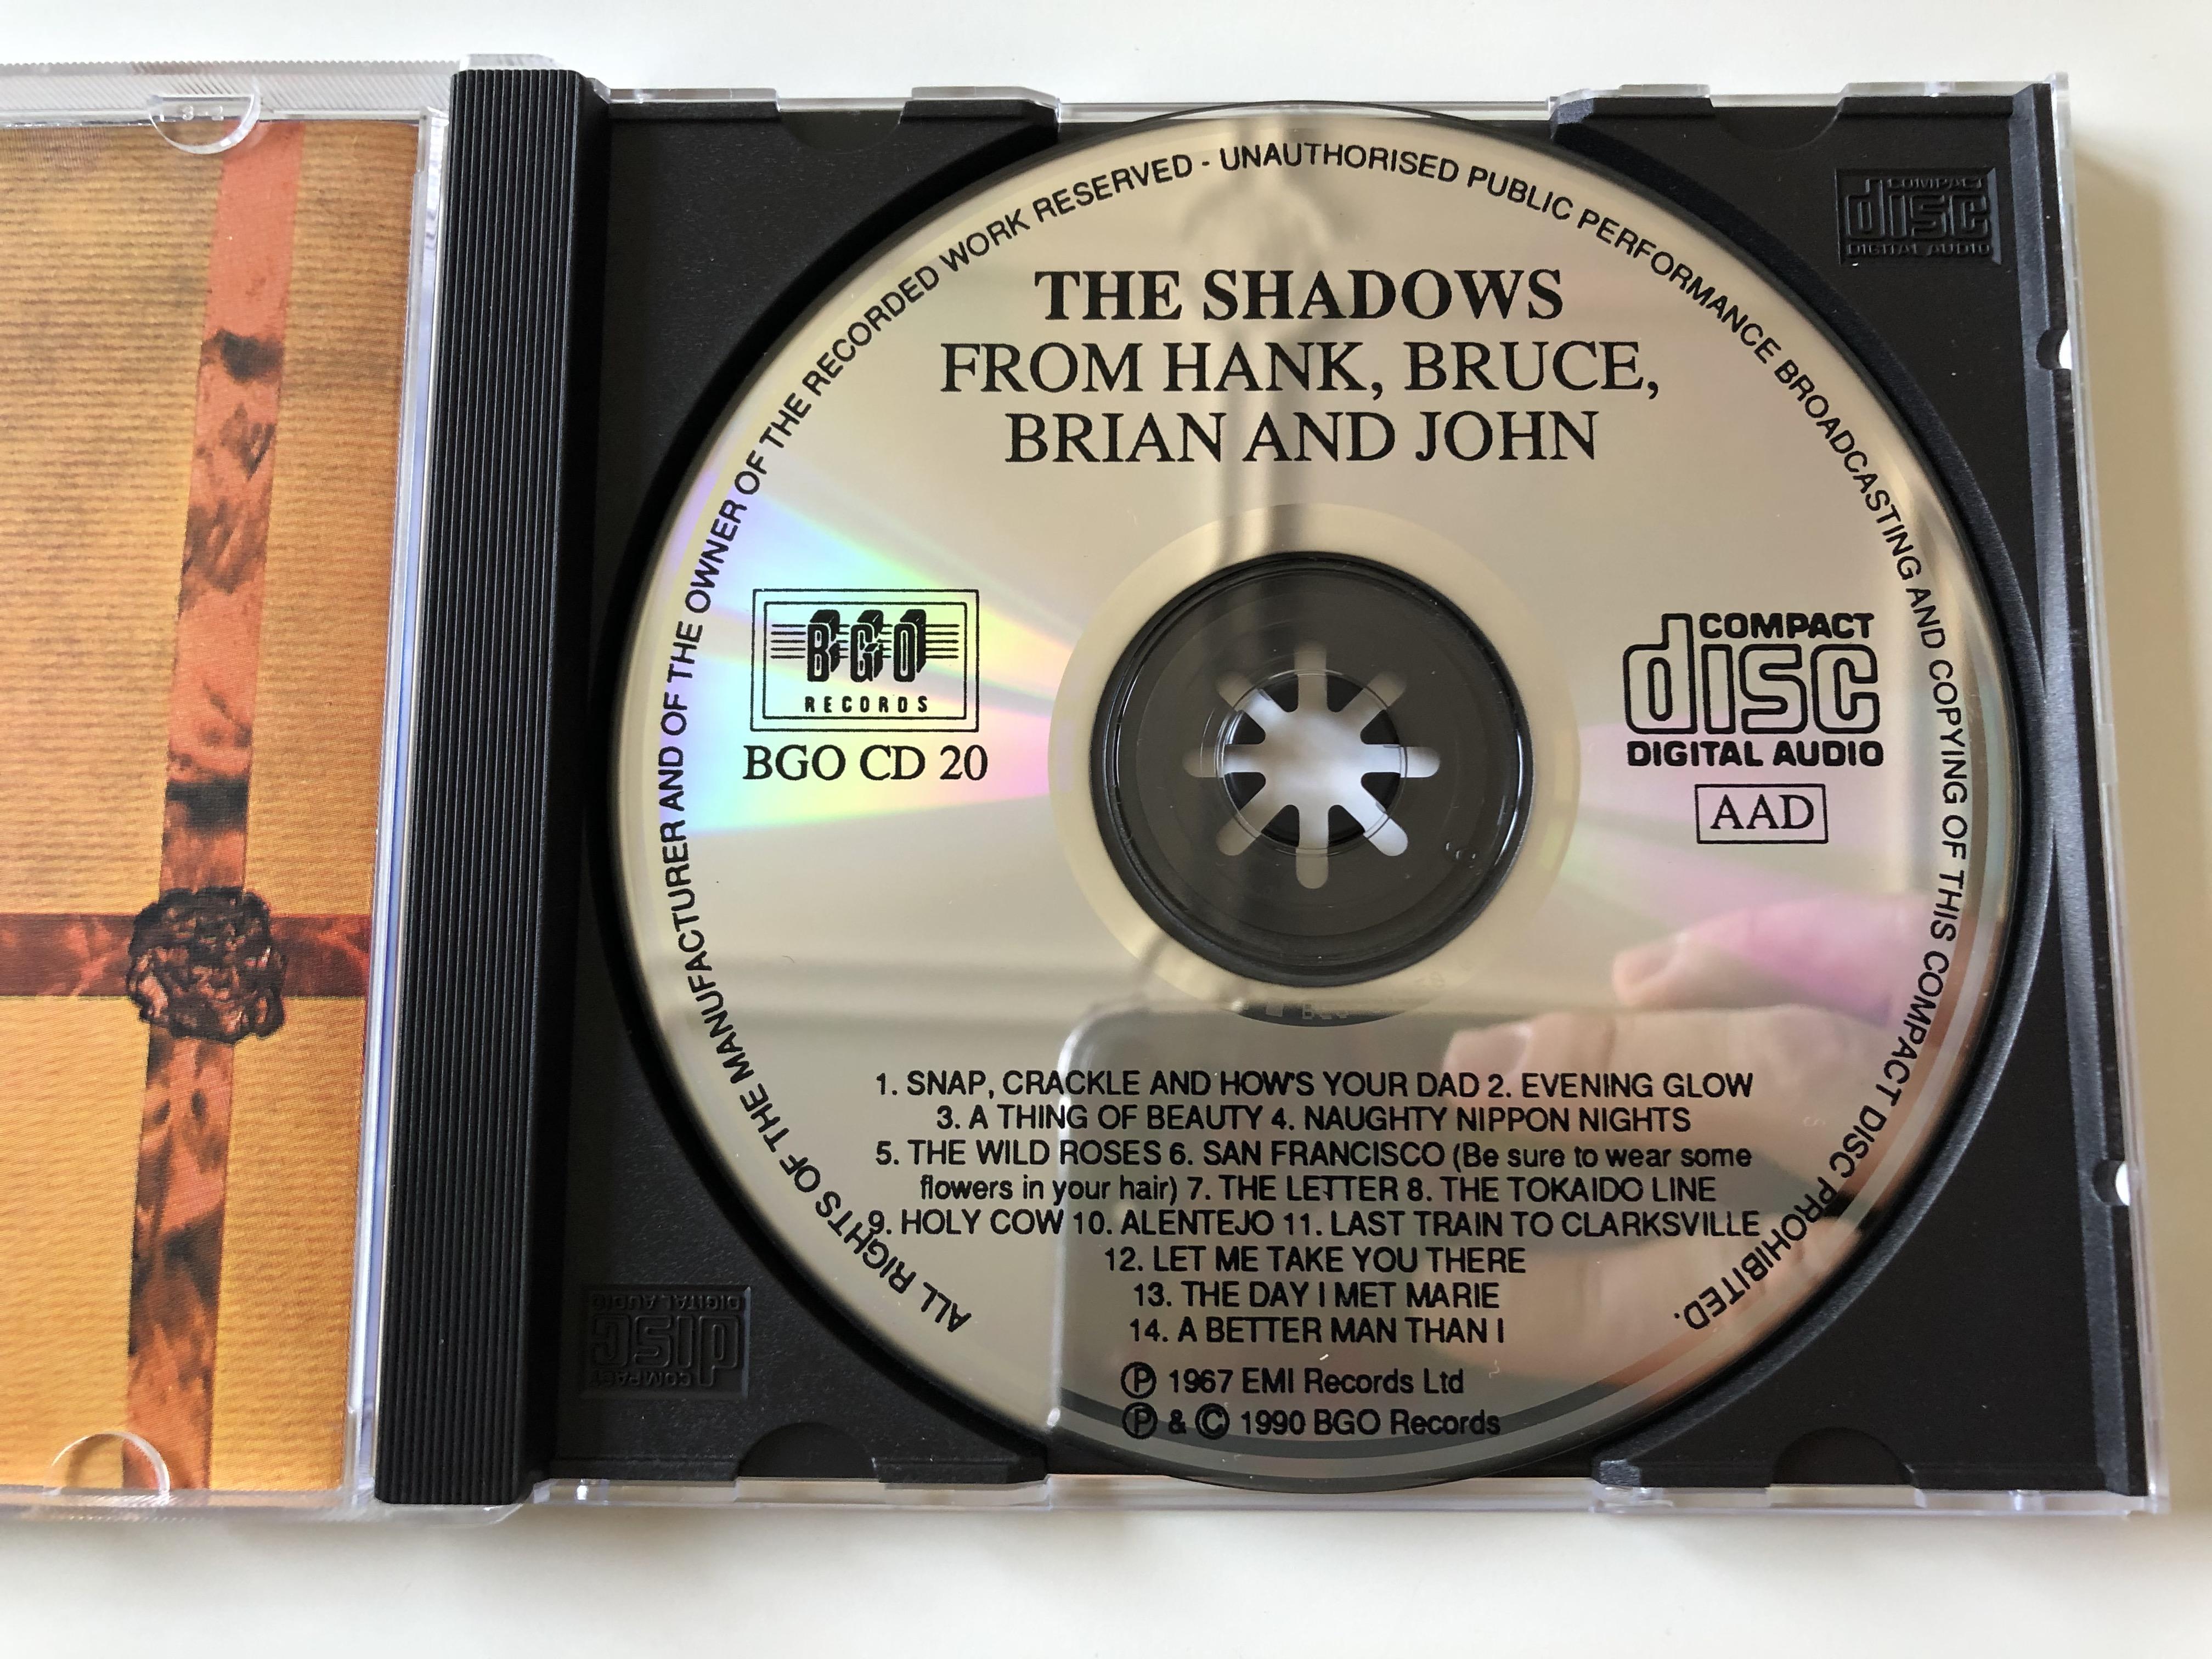 the-shadows-from-hank-brian-bruce-john-bgo-records-audio-cd-1990-bgocd20-4-.jpg